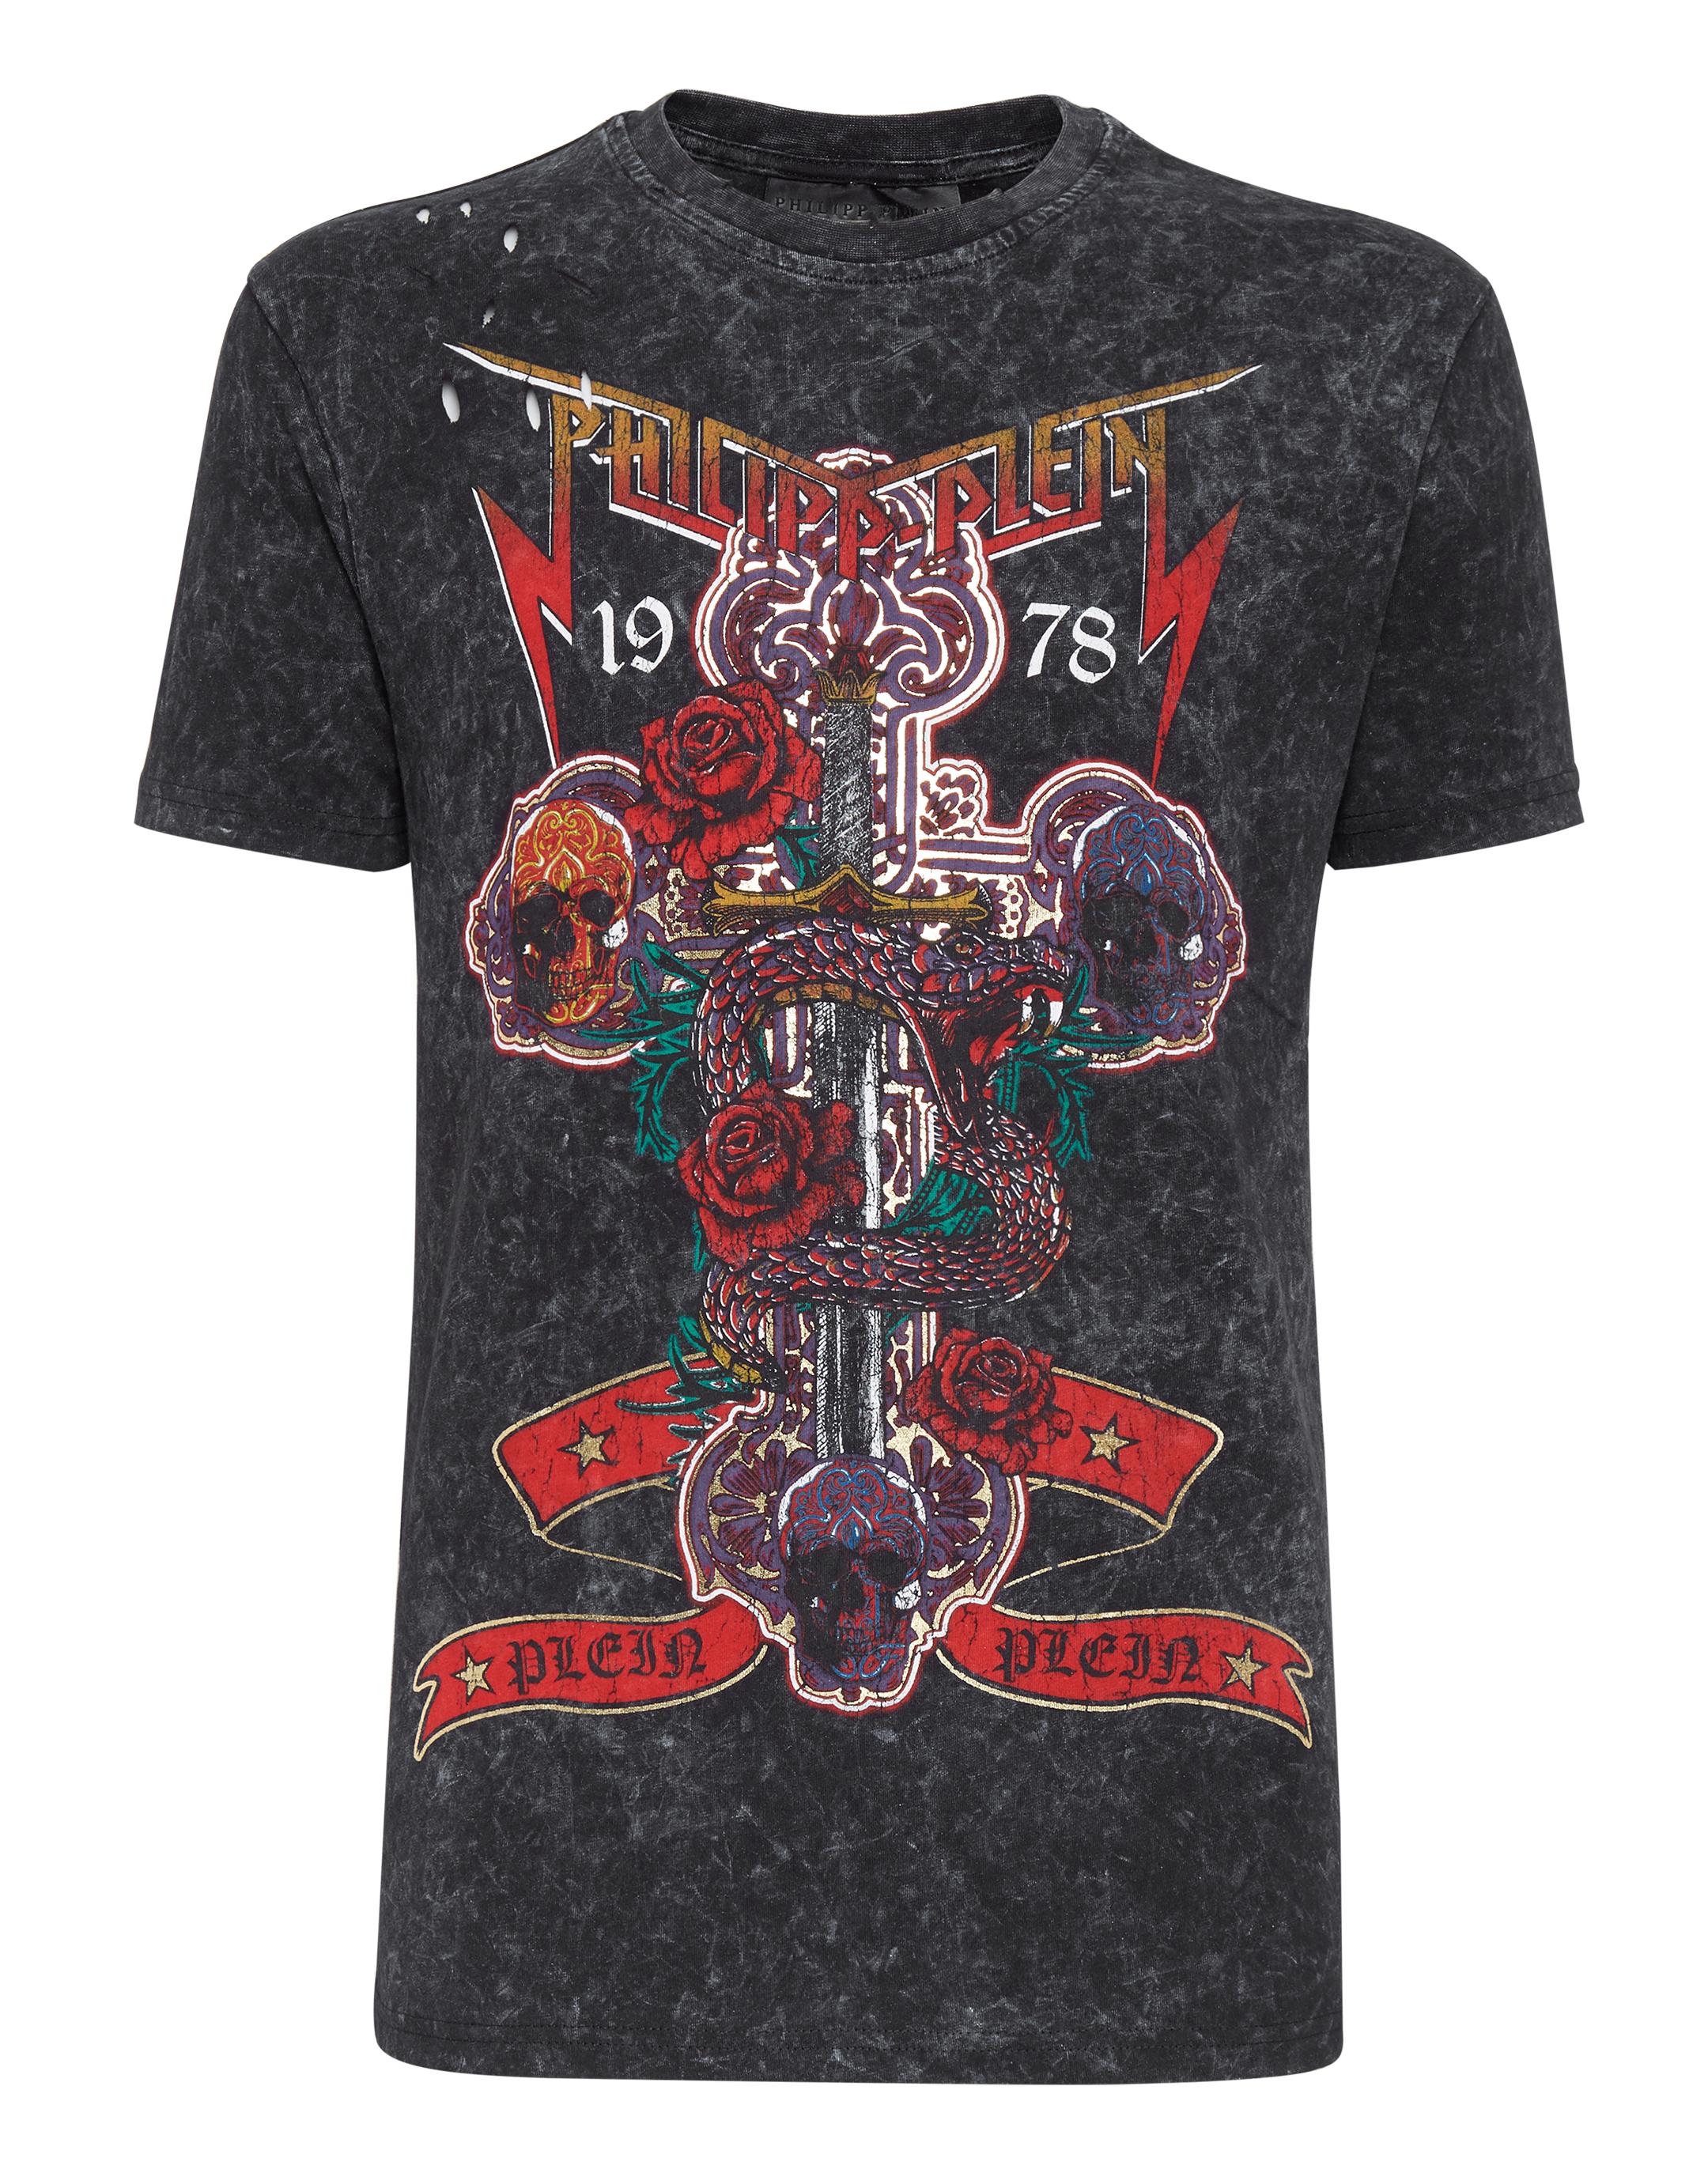 a69cd9d64b75 T-shirt Round Neck SS Rock PP   Philipp Plein